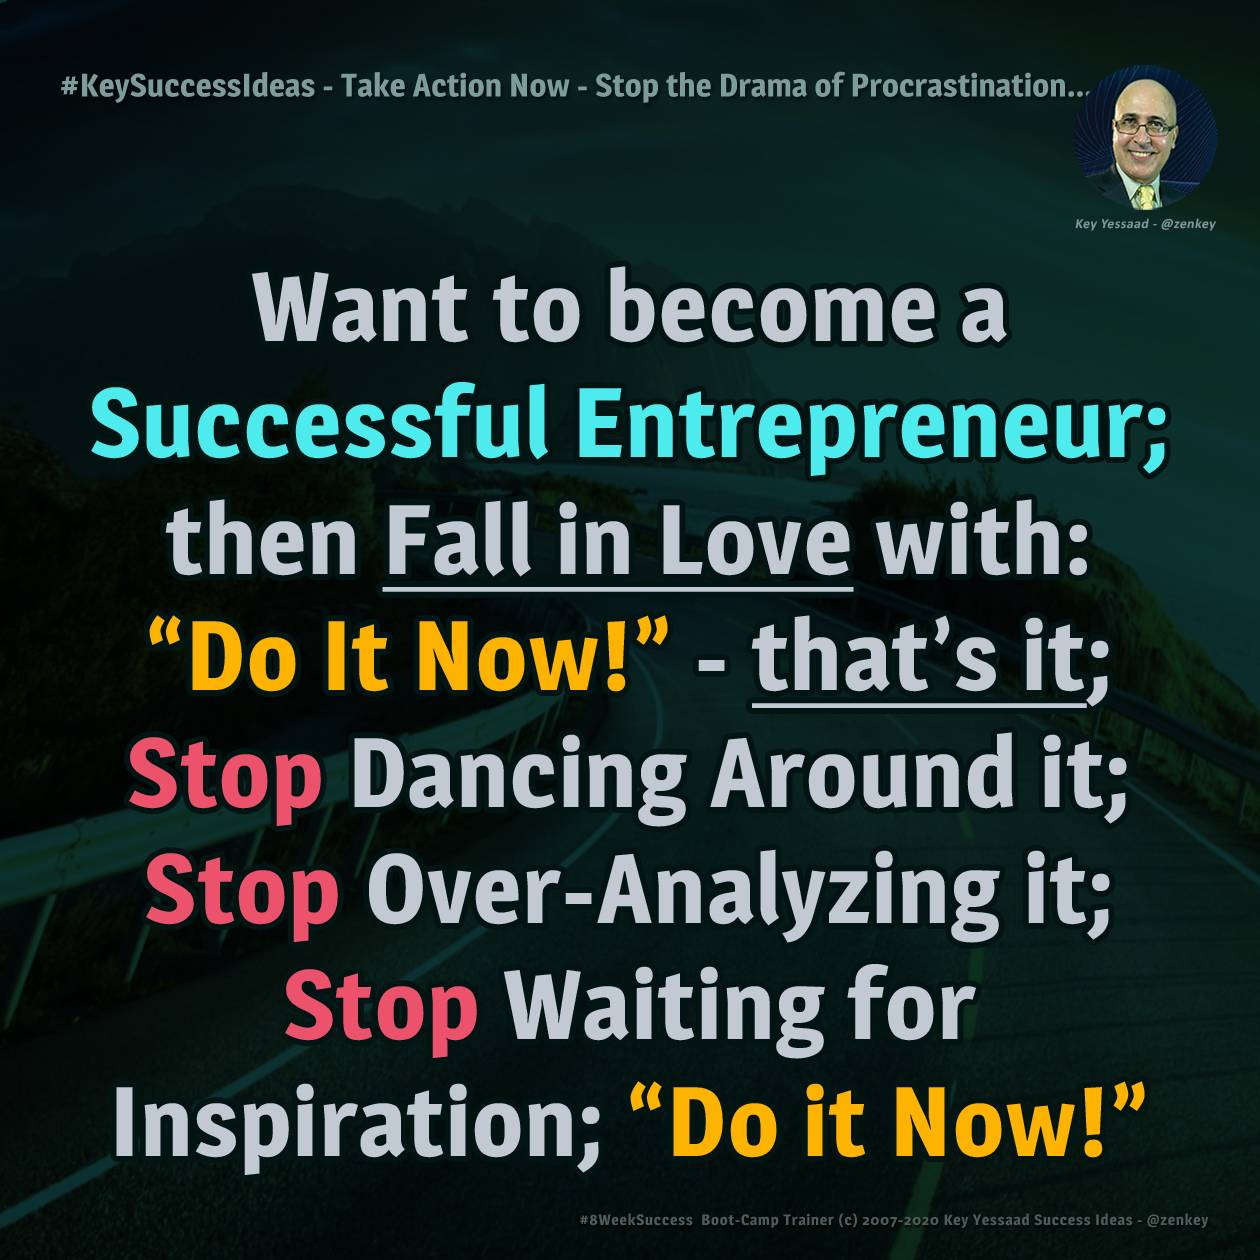 Take Action Now - Stop the Drama of Procrastination...  - #KeySuccessIdeas